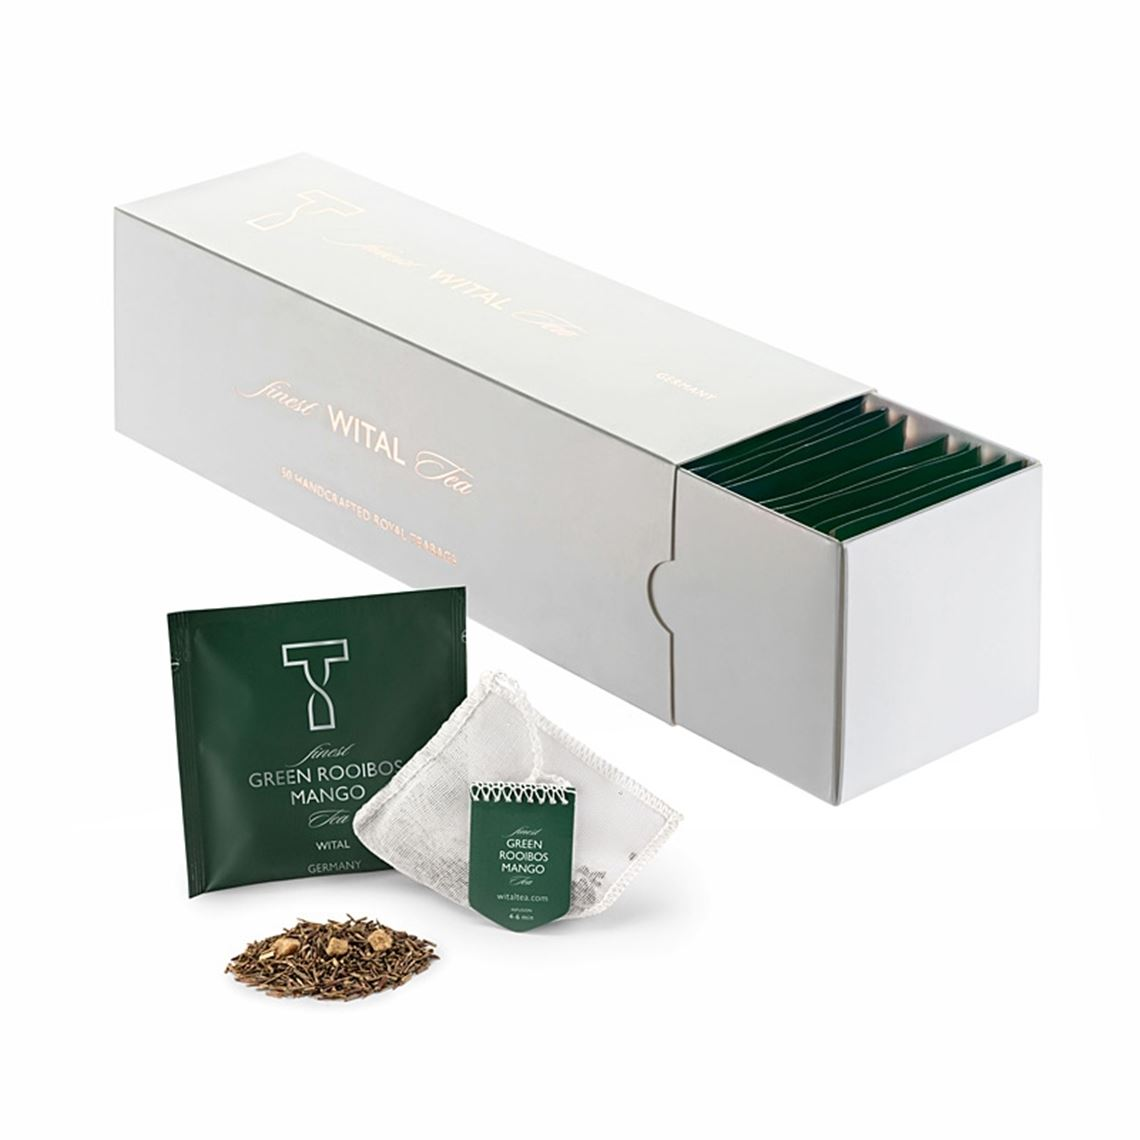 Wital Finest tea HoReCa Green Rooibos Mango 50x2,5g